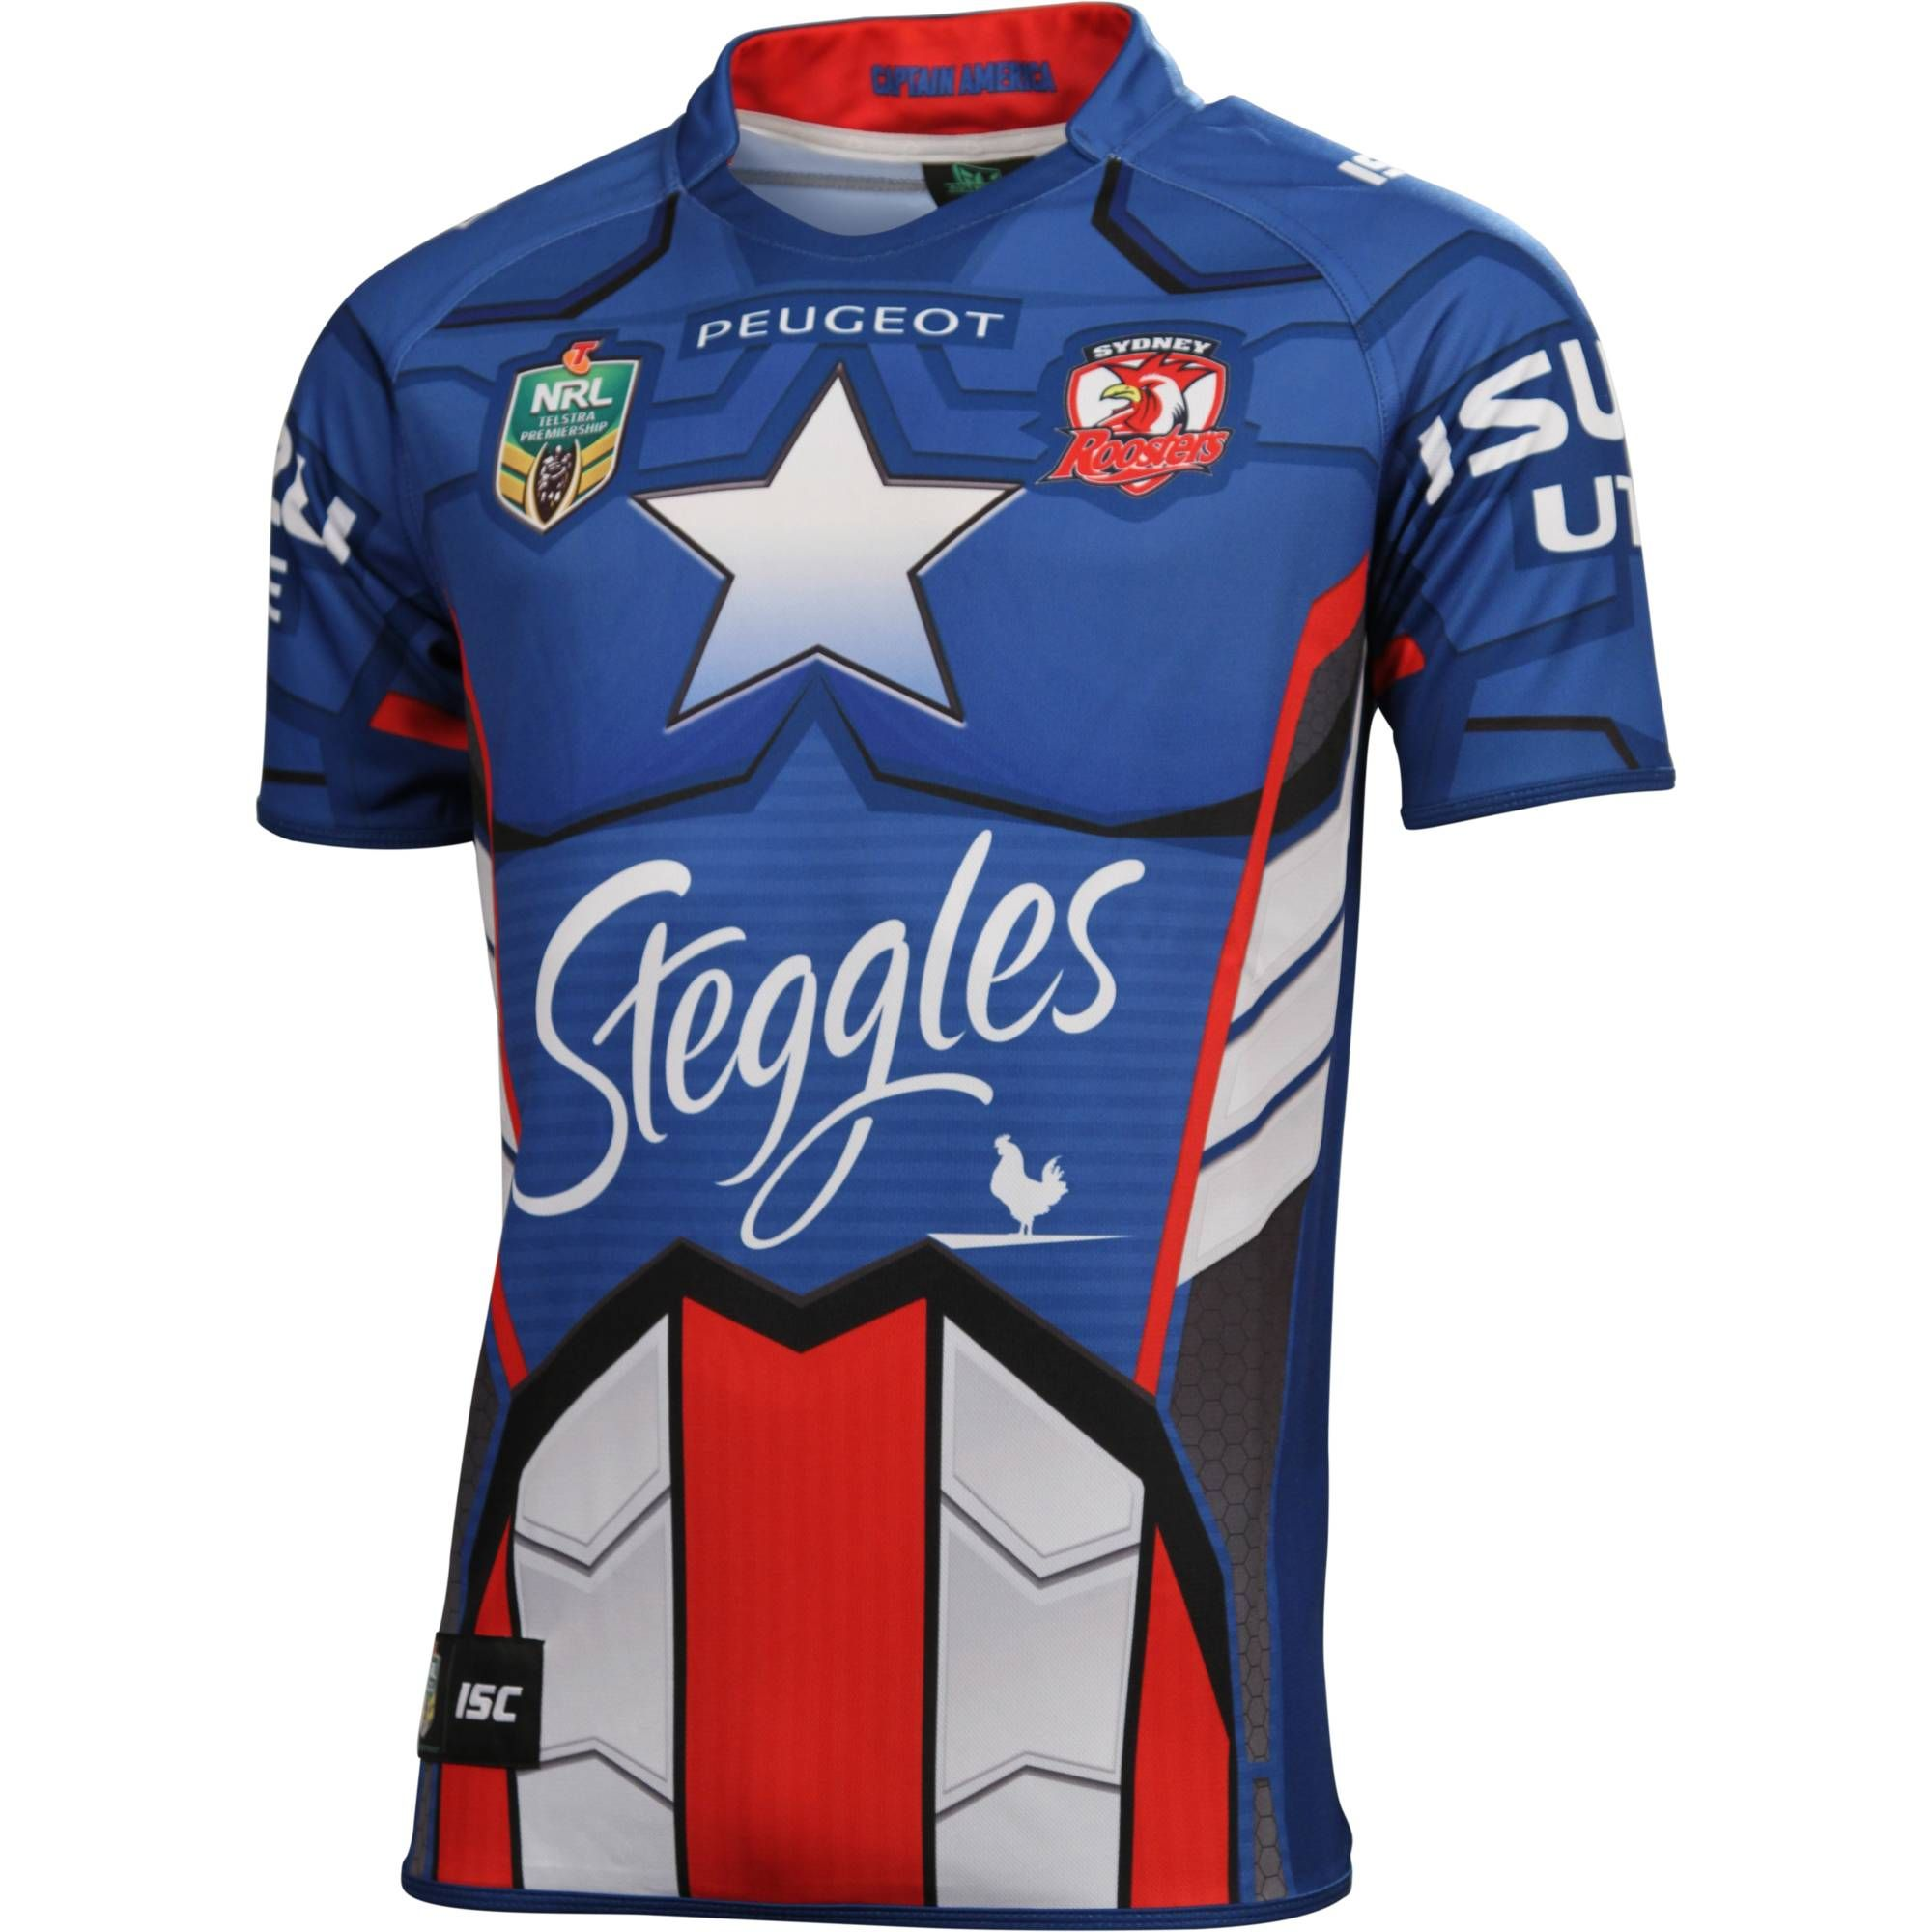 Sydney Roosters 2014 Men s Captain America Jersey - NRL Megastore ... cb7575ee9